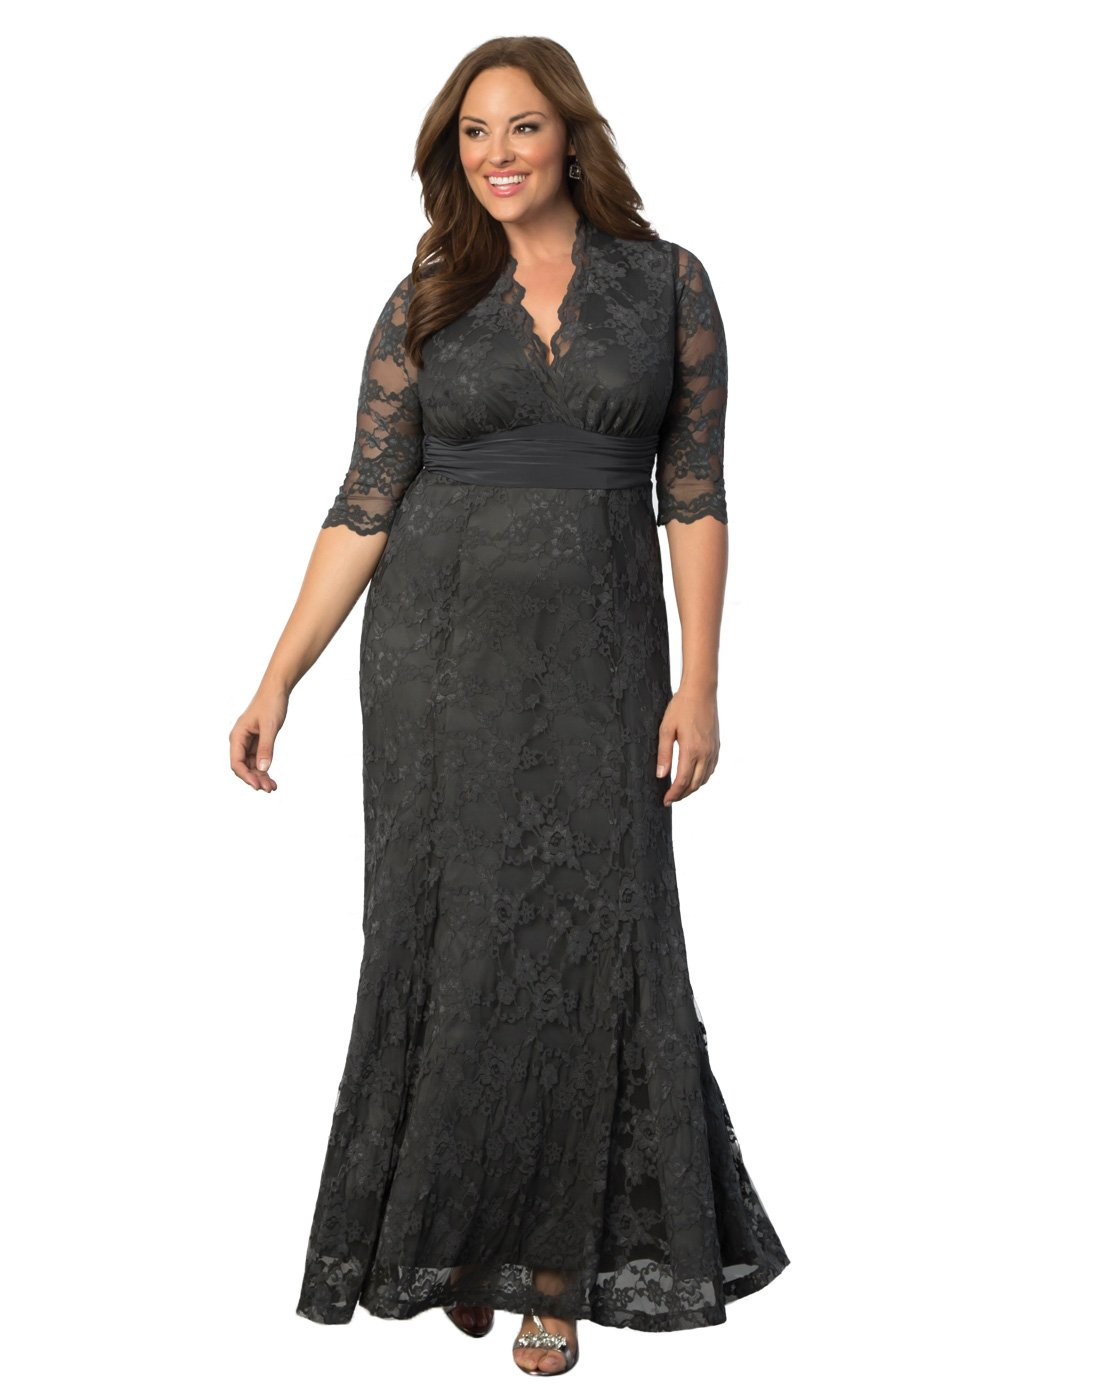 Kiyonna Women's Plus Size Screen Siren Lace Gown 1x Twilight Grey by Kiyonna Clothing